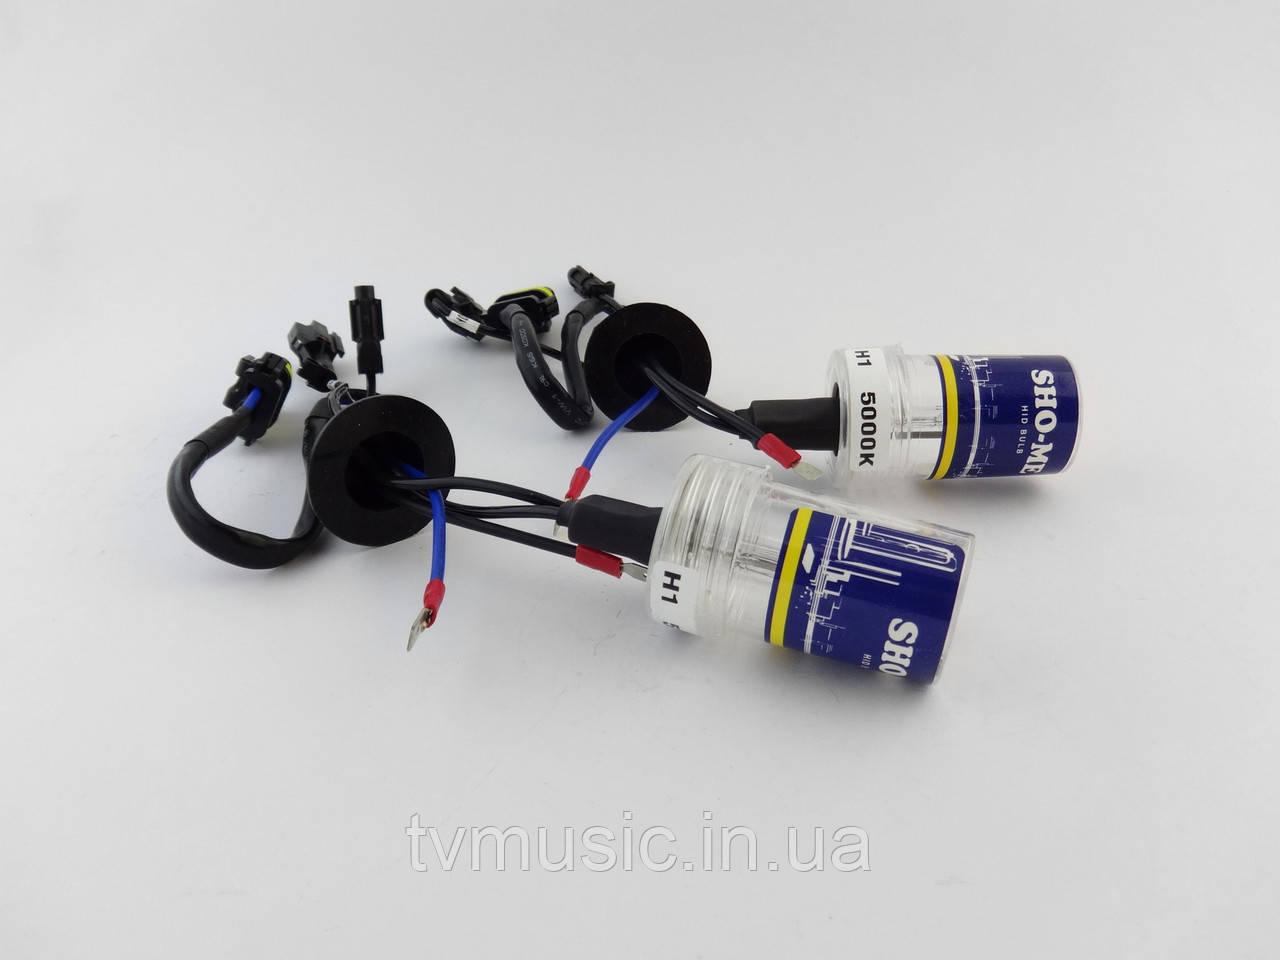 Ксеноновая лампа Sho Me H3 3000K 35W